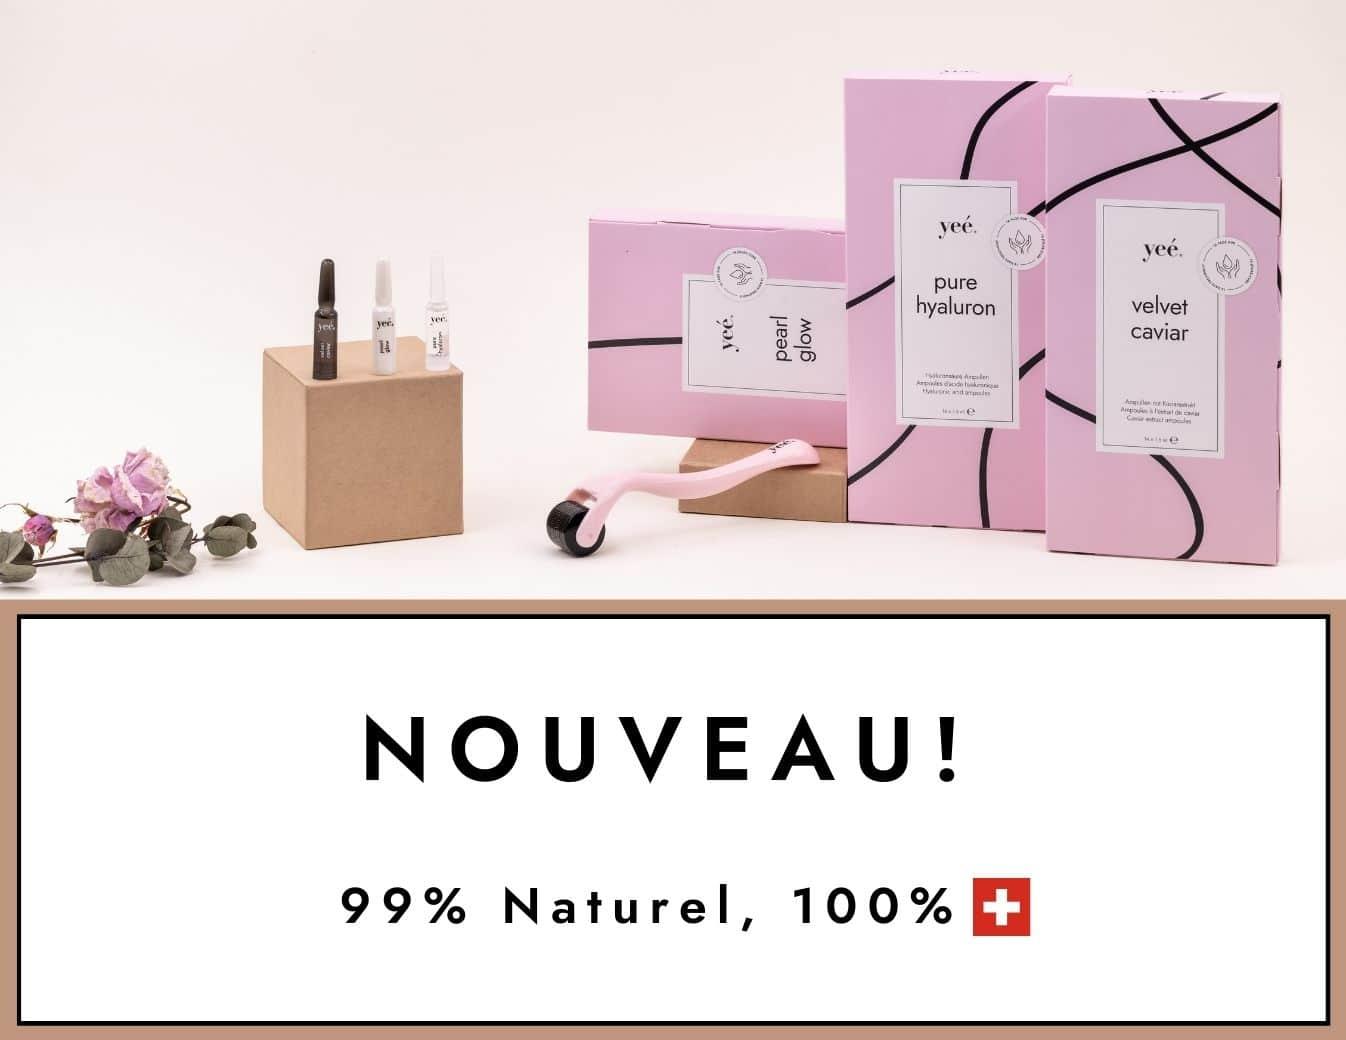 Yeé Cosmetics - Acide Hyaluronique Ampouls, caviar Ampouls und Pearl Glow Ampouls, Hyaluron